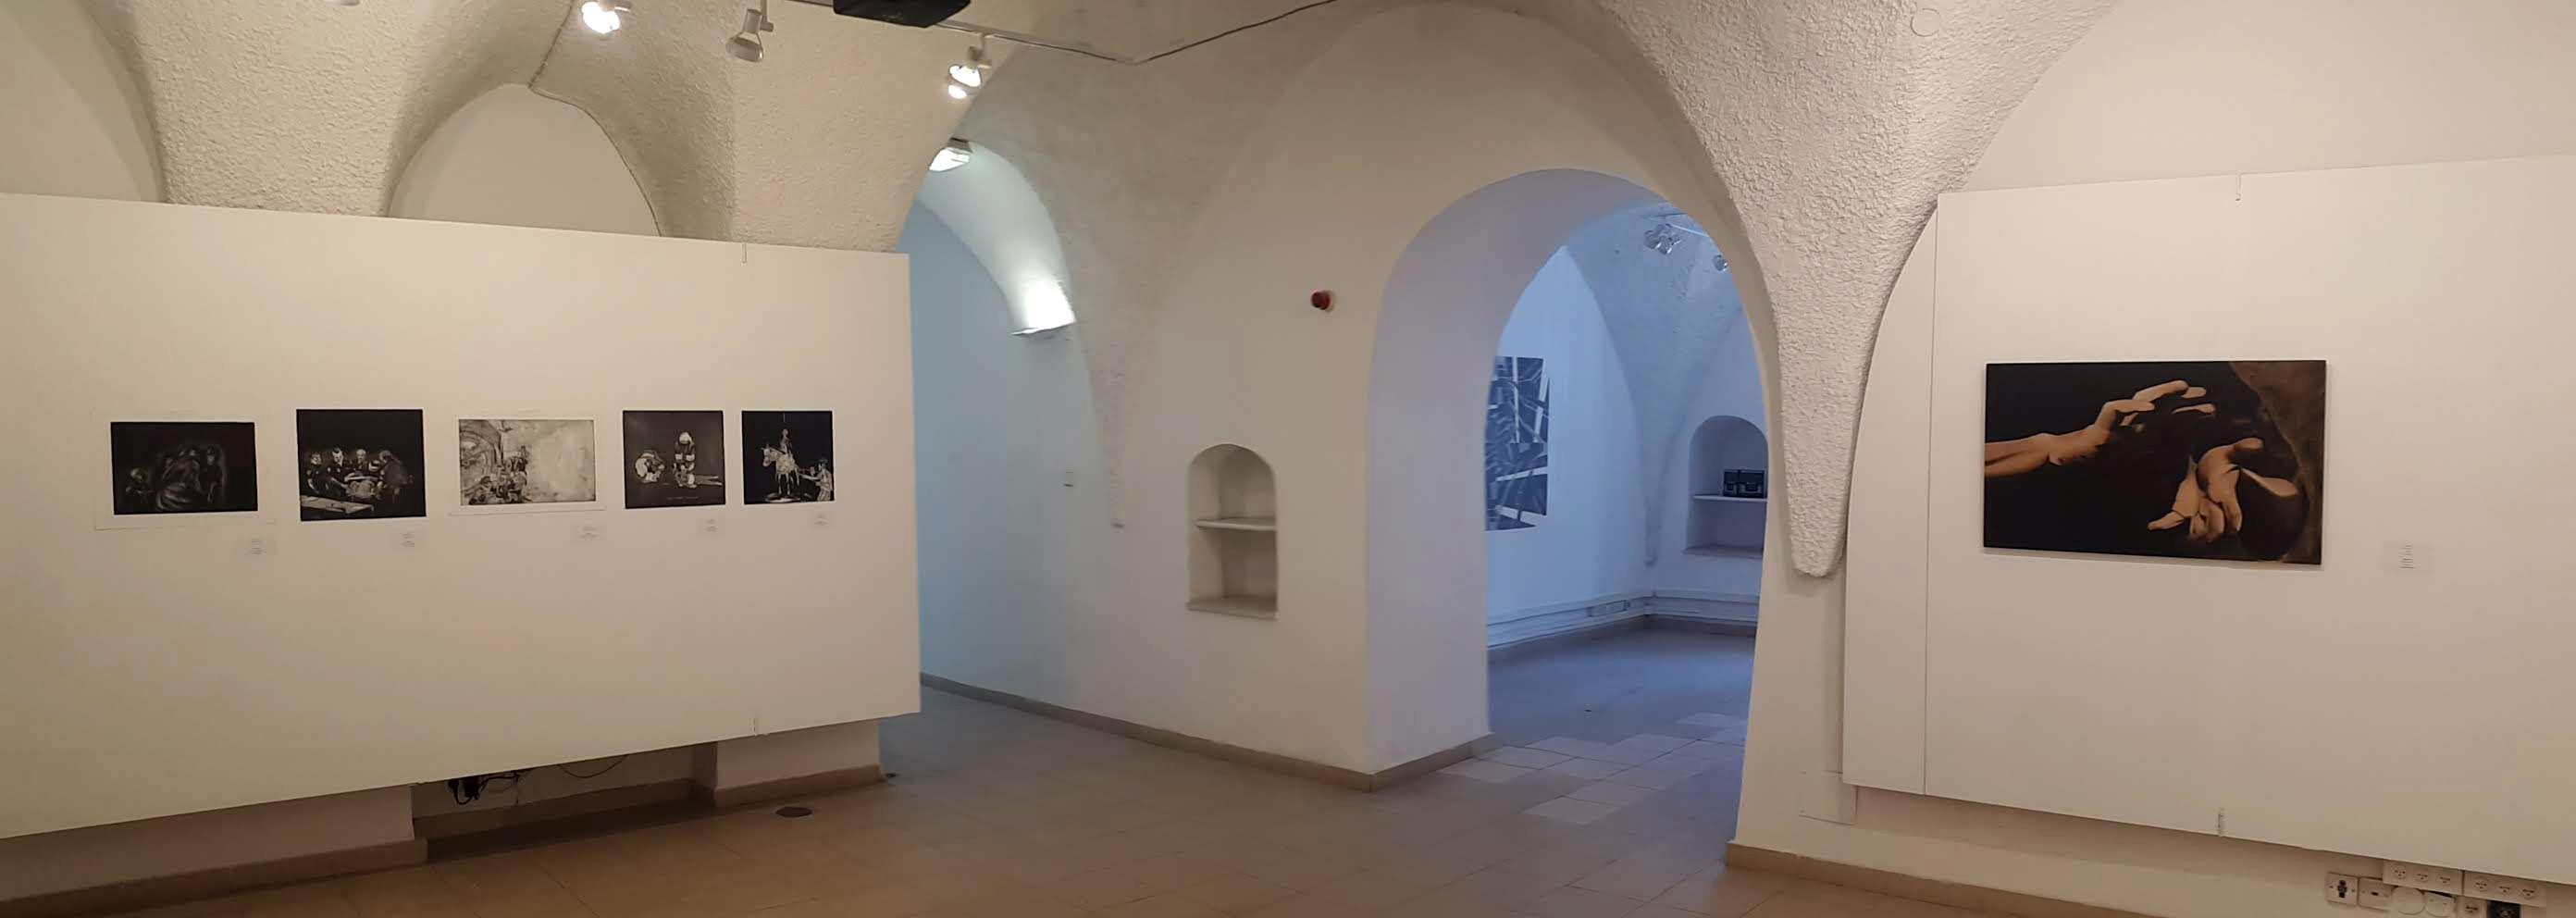 Exhibition view III